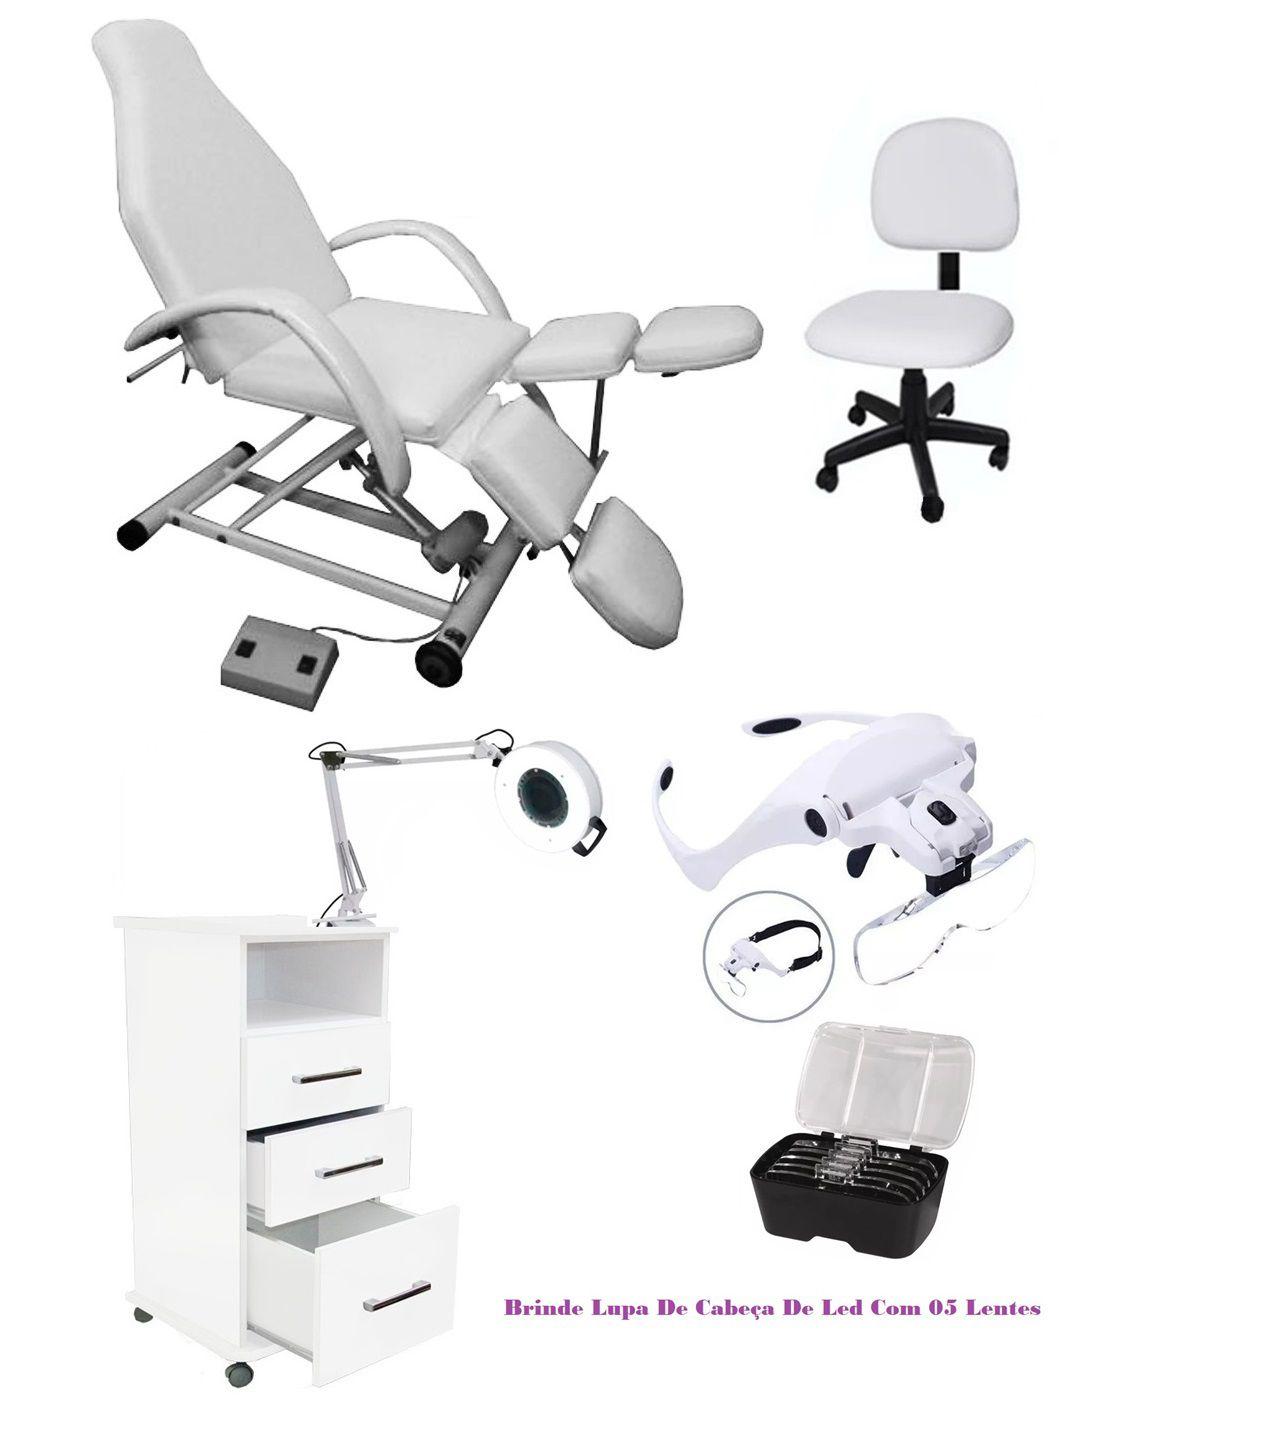 Kit Podologia Cadeira Semi Elétrica Mocho Exaustor Carrinho Brinde Lupa